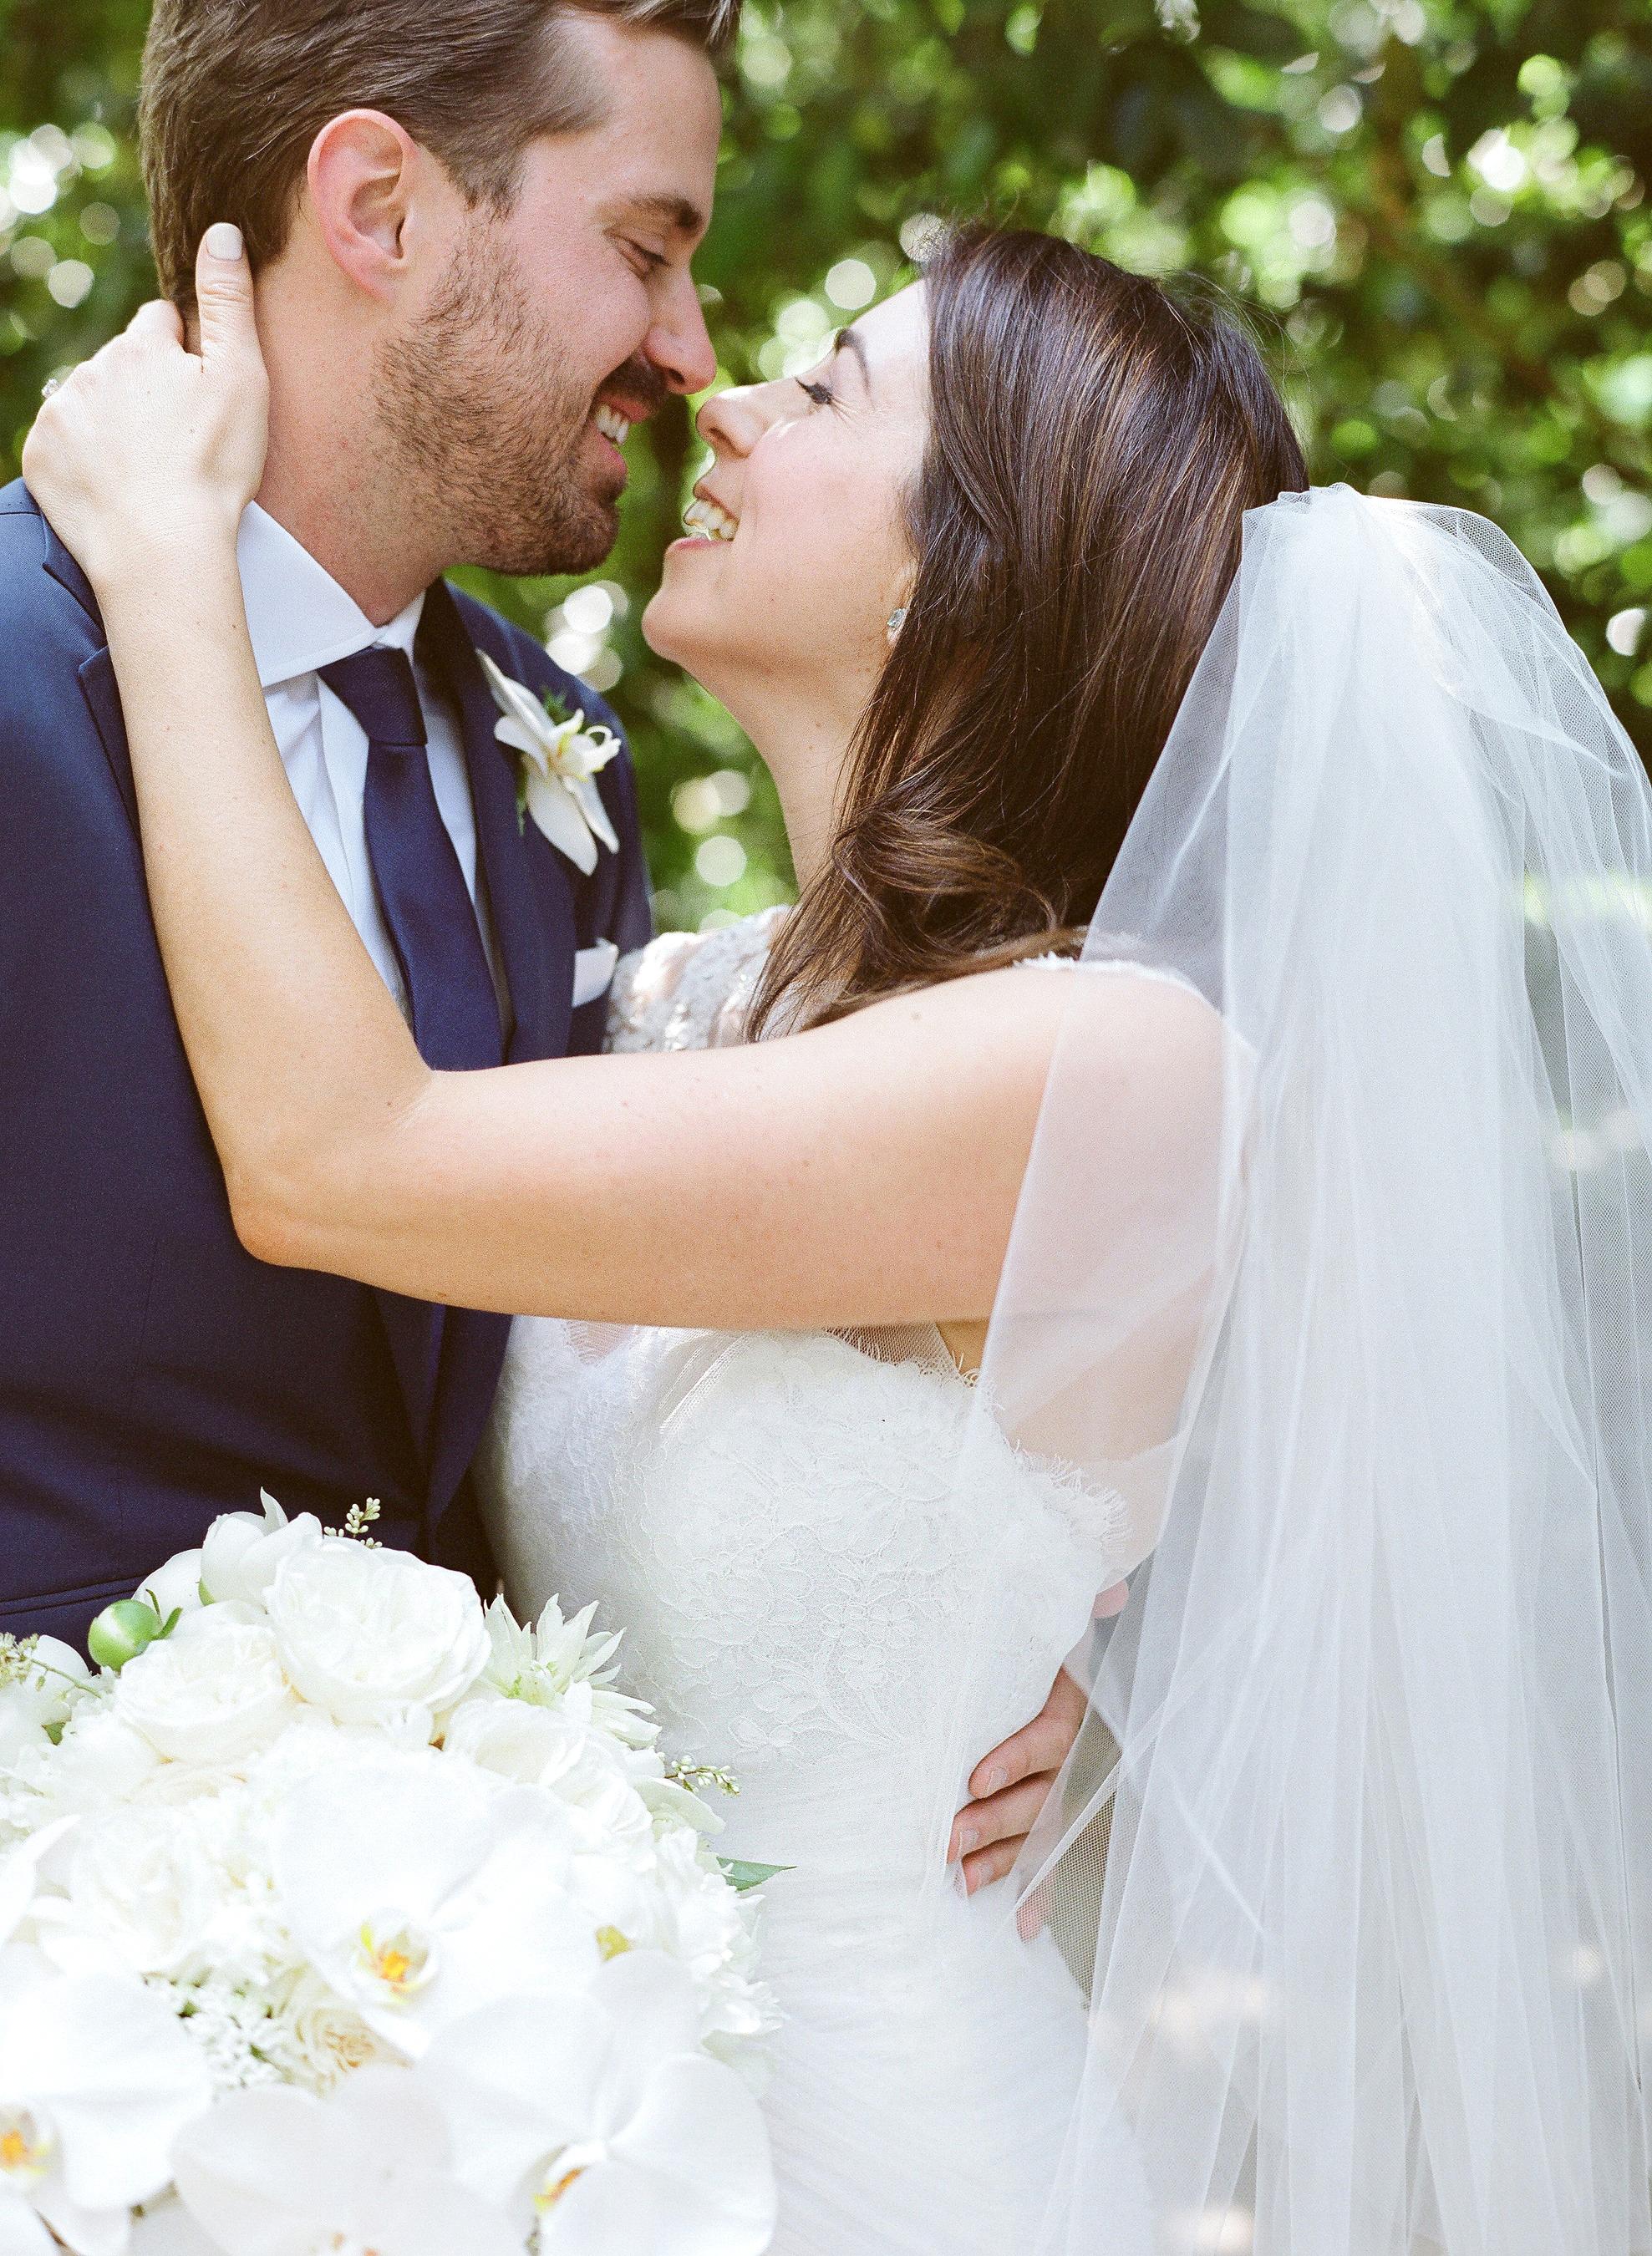 giordana and geoffrey bride and groom